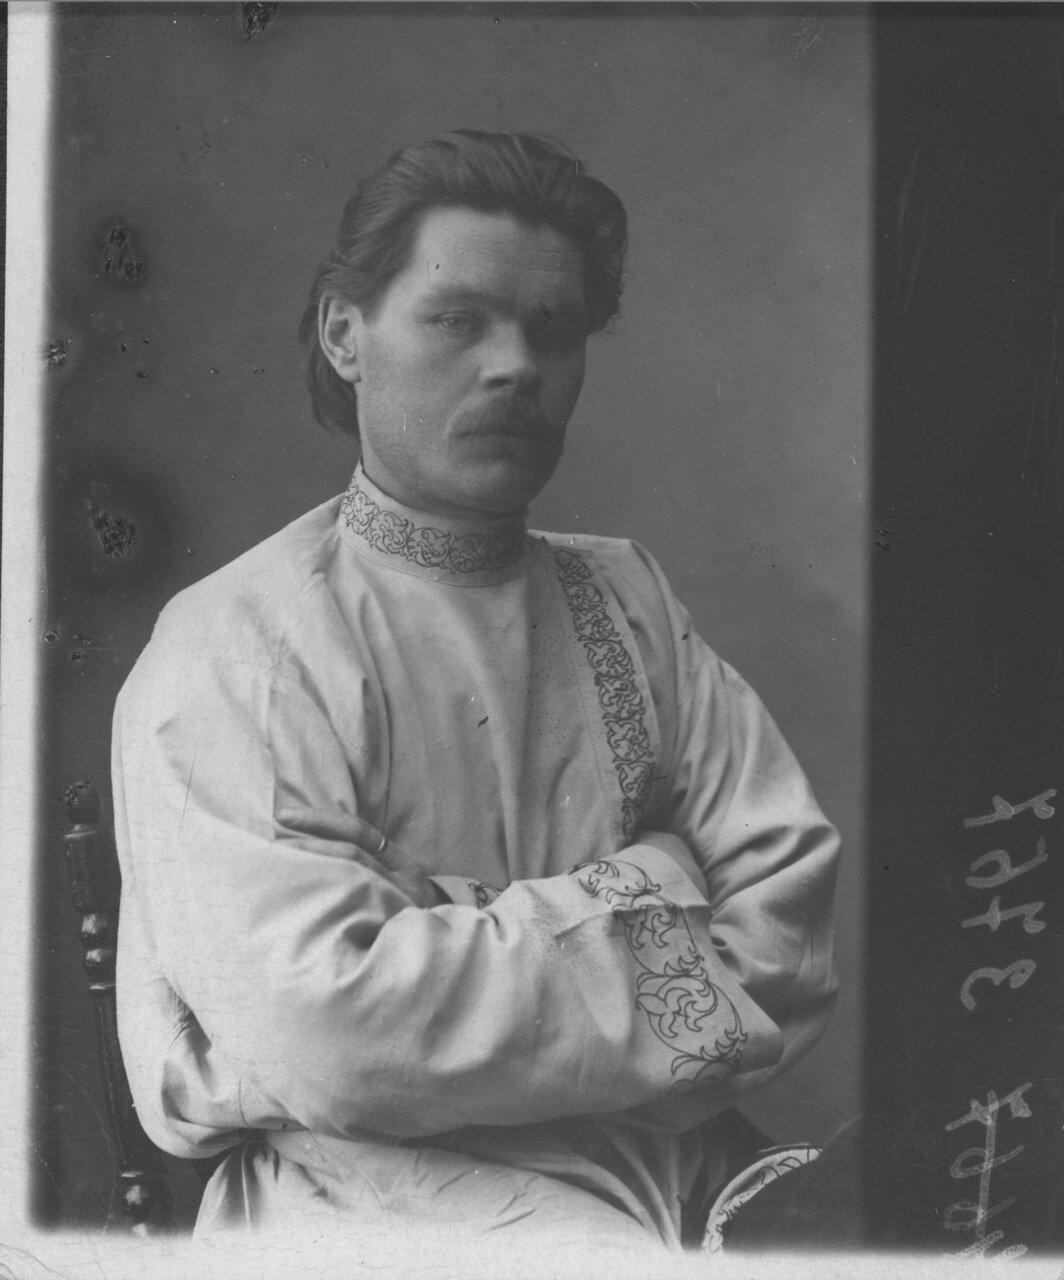 Портрет А. М. Горького в белой косоворотке г. Нижний Новгород Фото М. П. Дмитриев  1898-1899 гг.